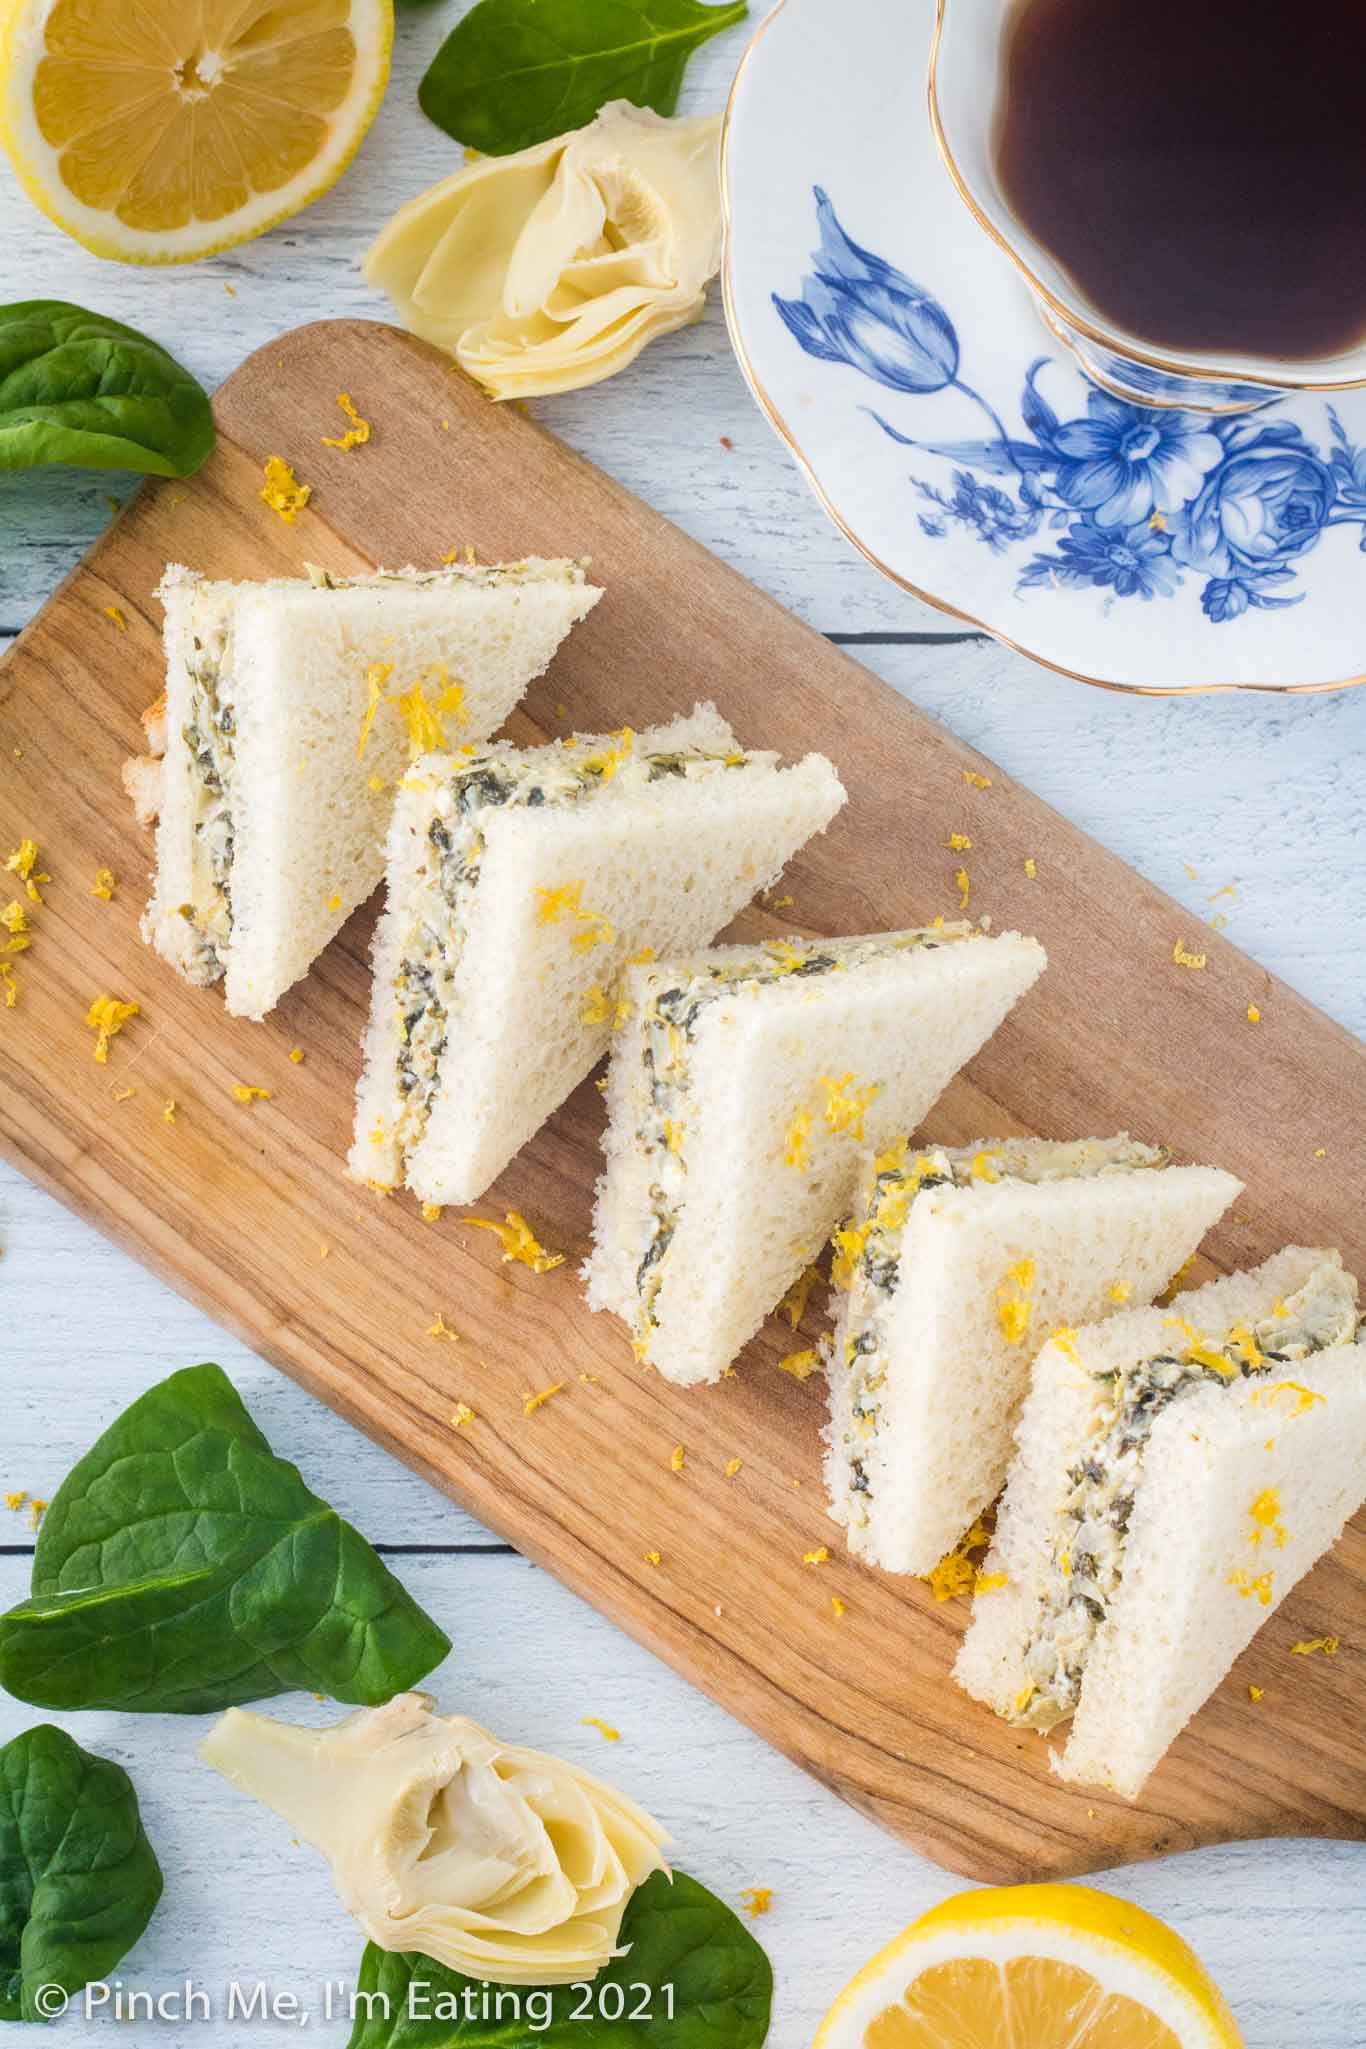 Spinach Artichoke Tea Sandwiches with Lemon